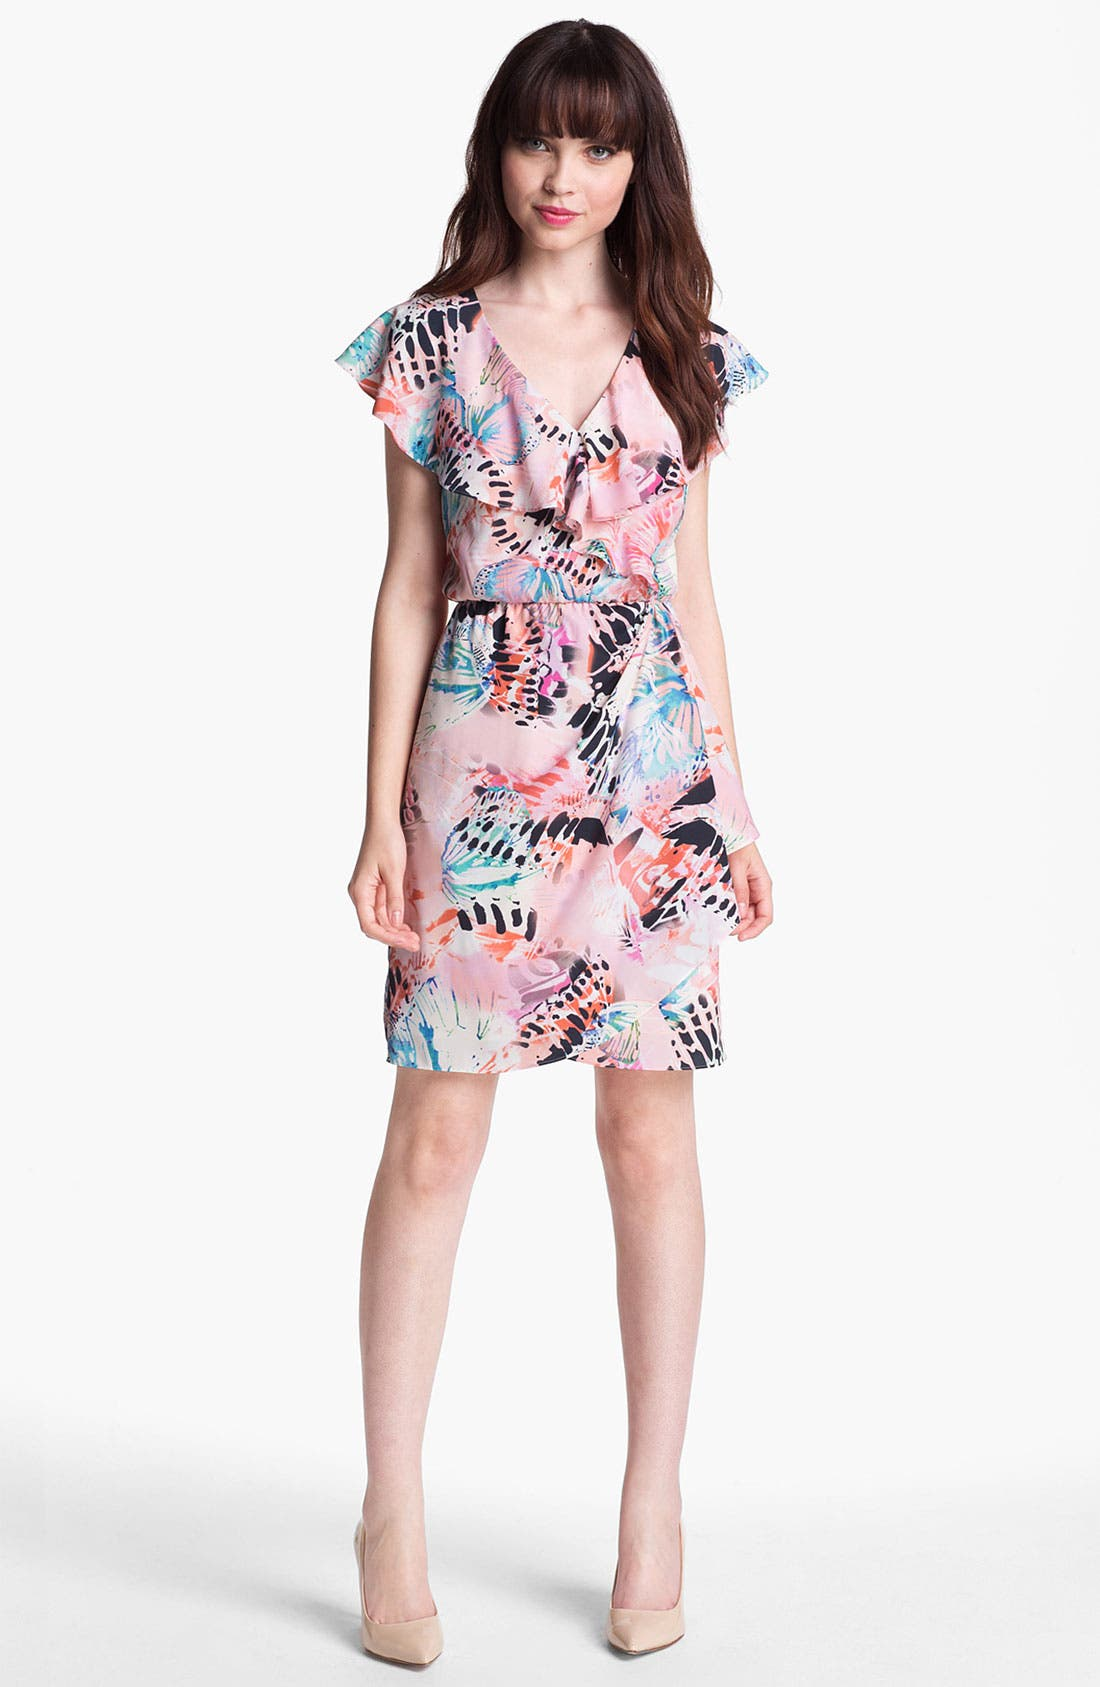 Alternate Image 1 Selected - Presley Skye Ruffled Faux Wrap Dress